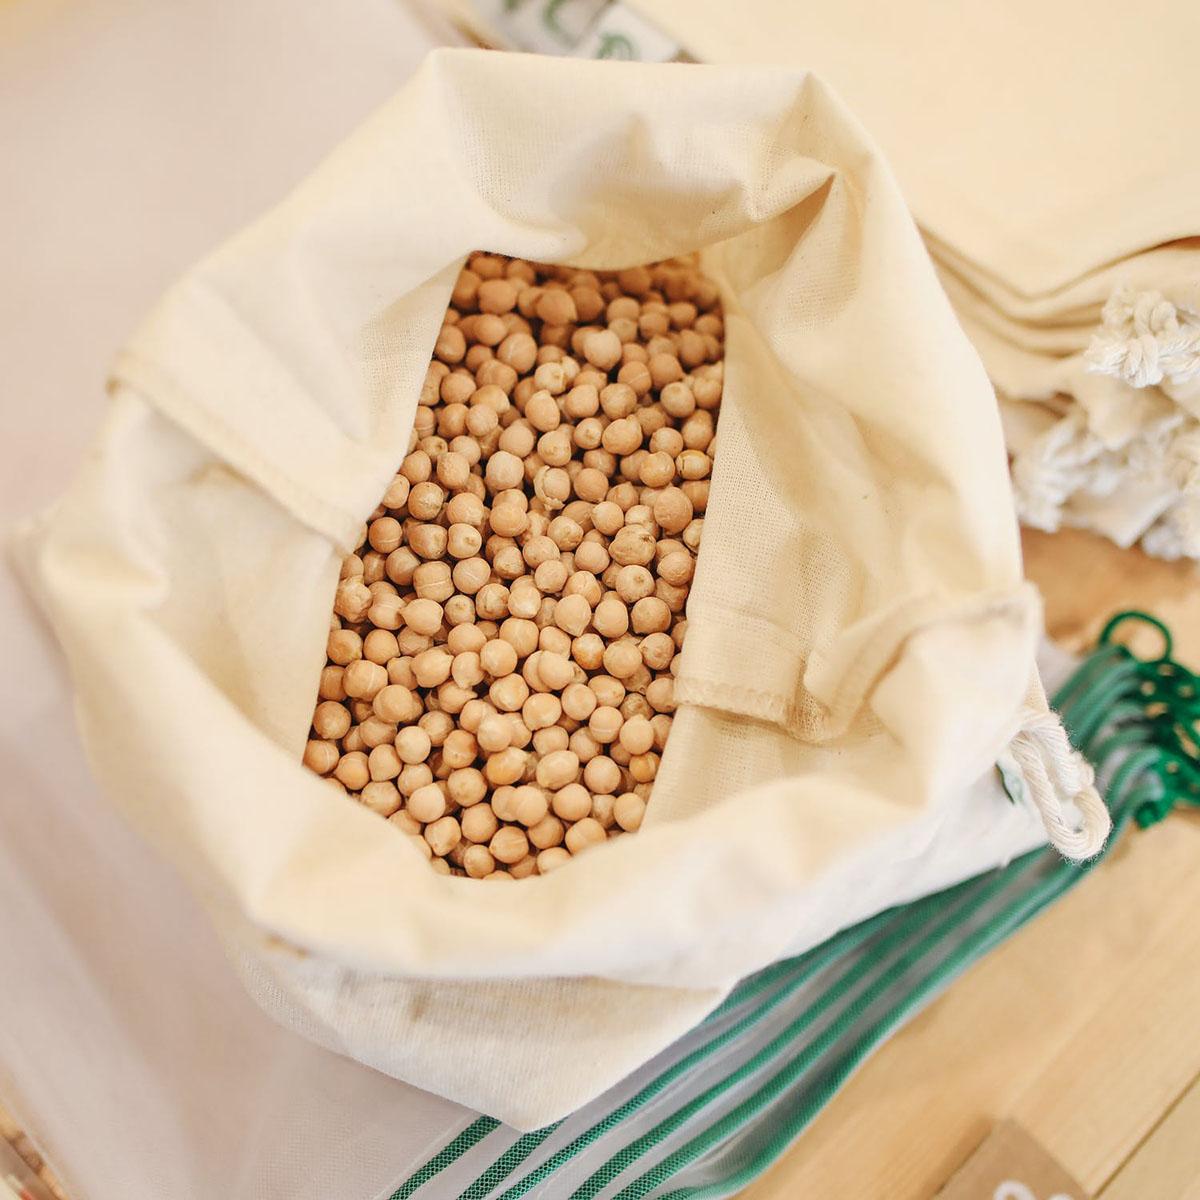 Durable cotton produce bags